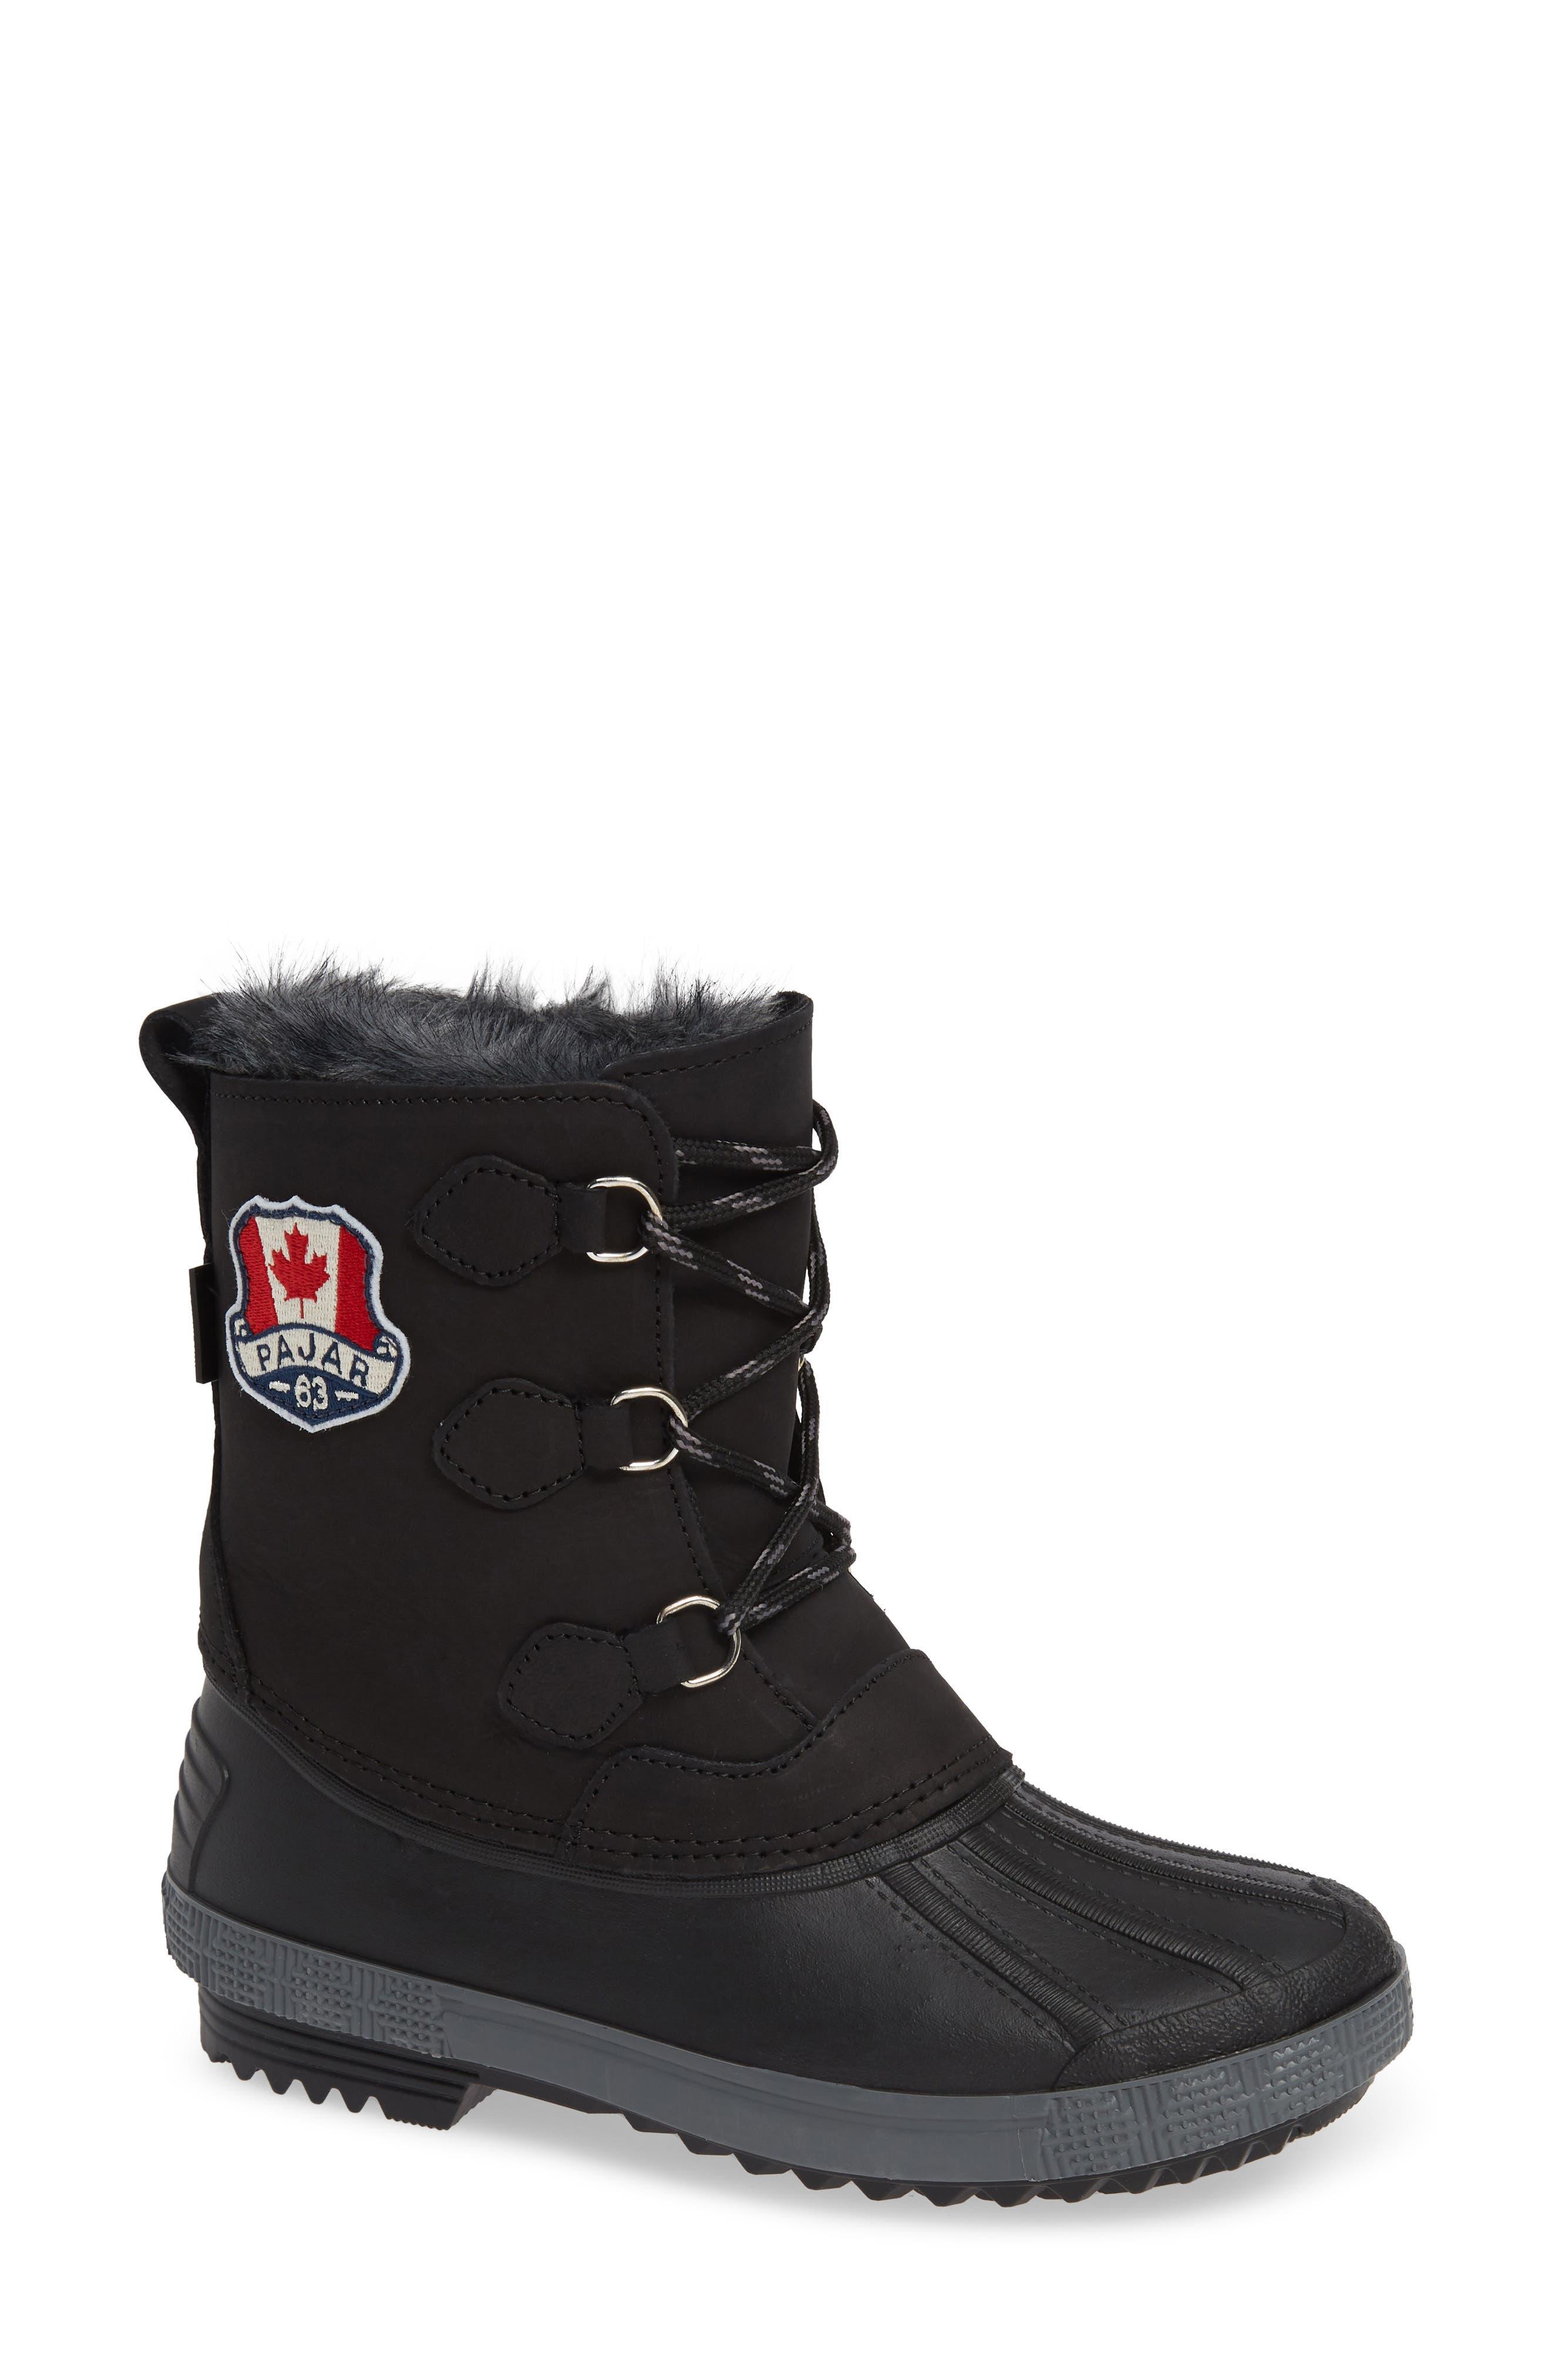 Cali Waterproof Insulated Boot,                             Main thumbnail 1, color,                             BROWN/ BLACK